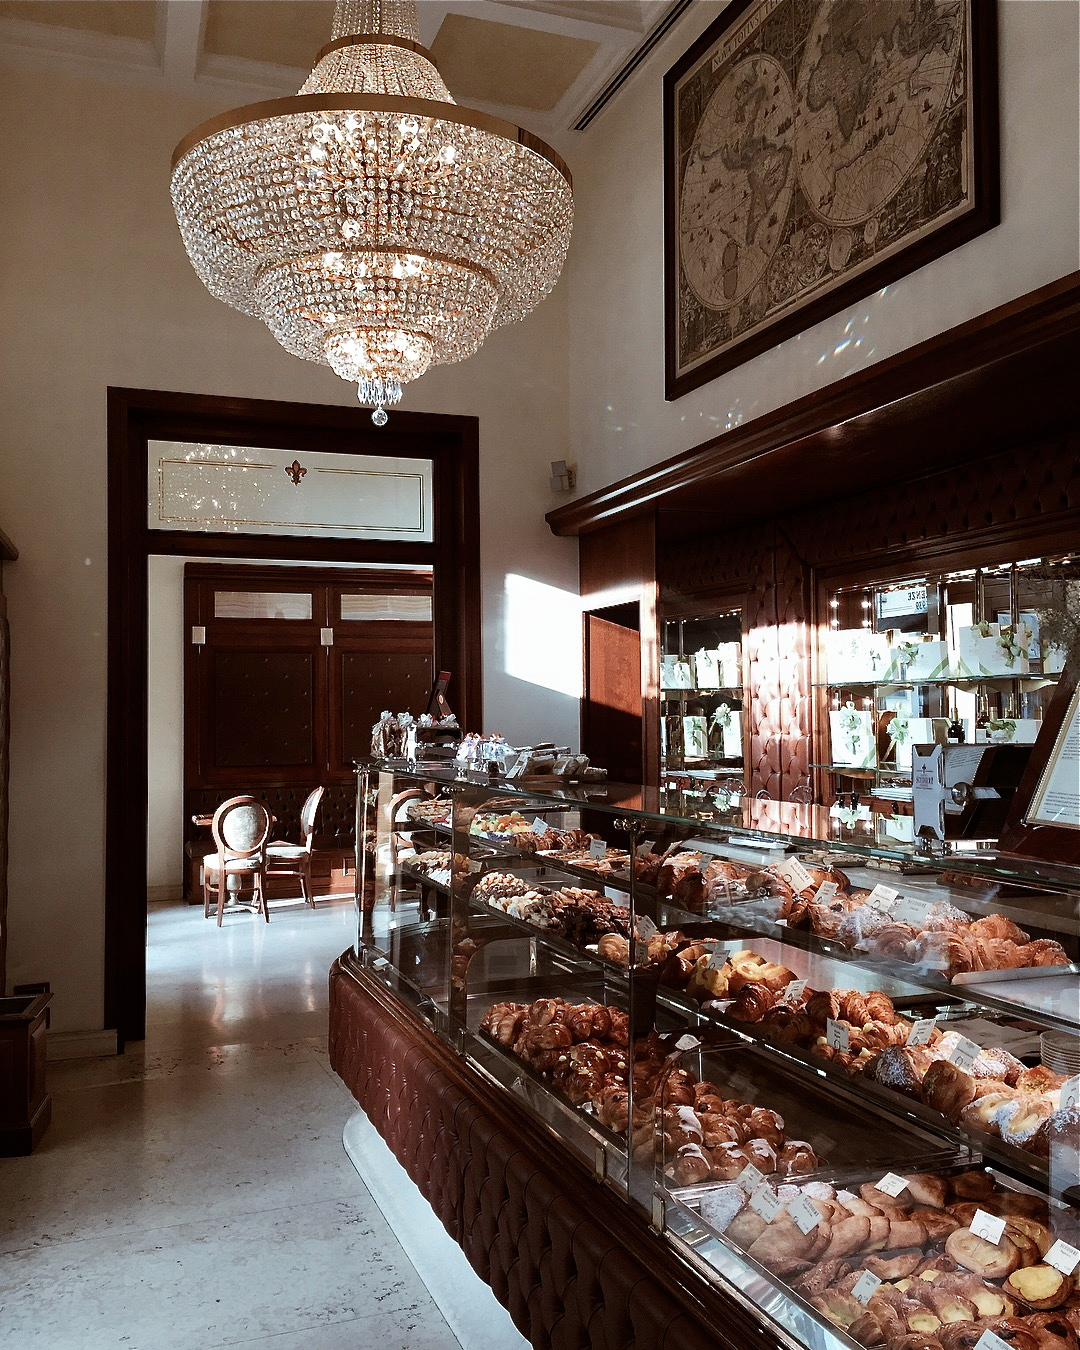 Caffe Scudieri, Florence, Italy